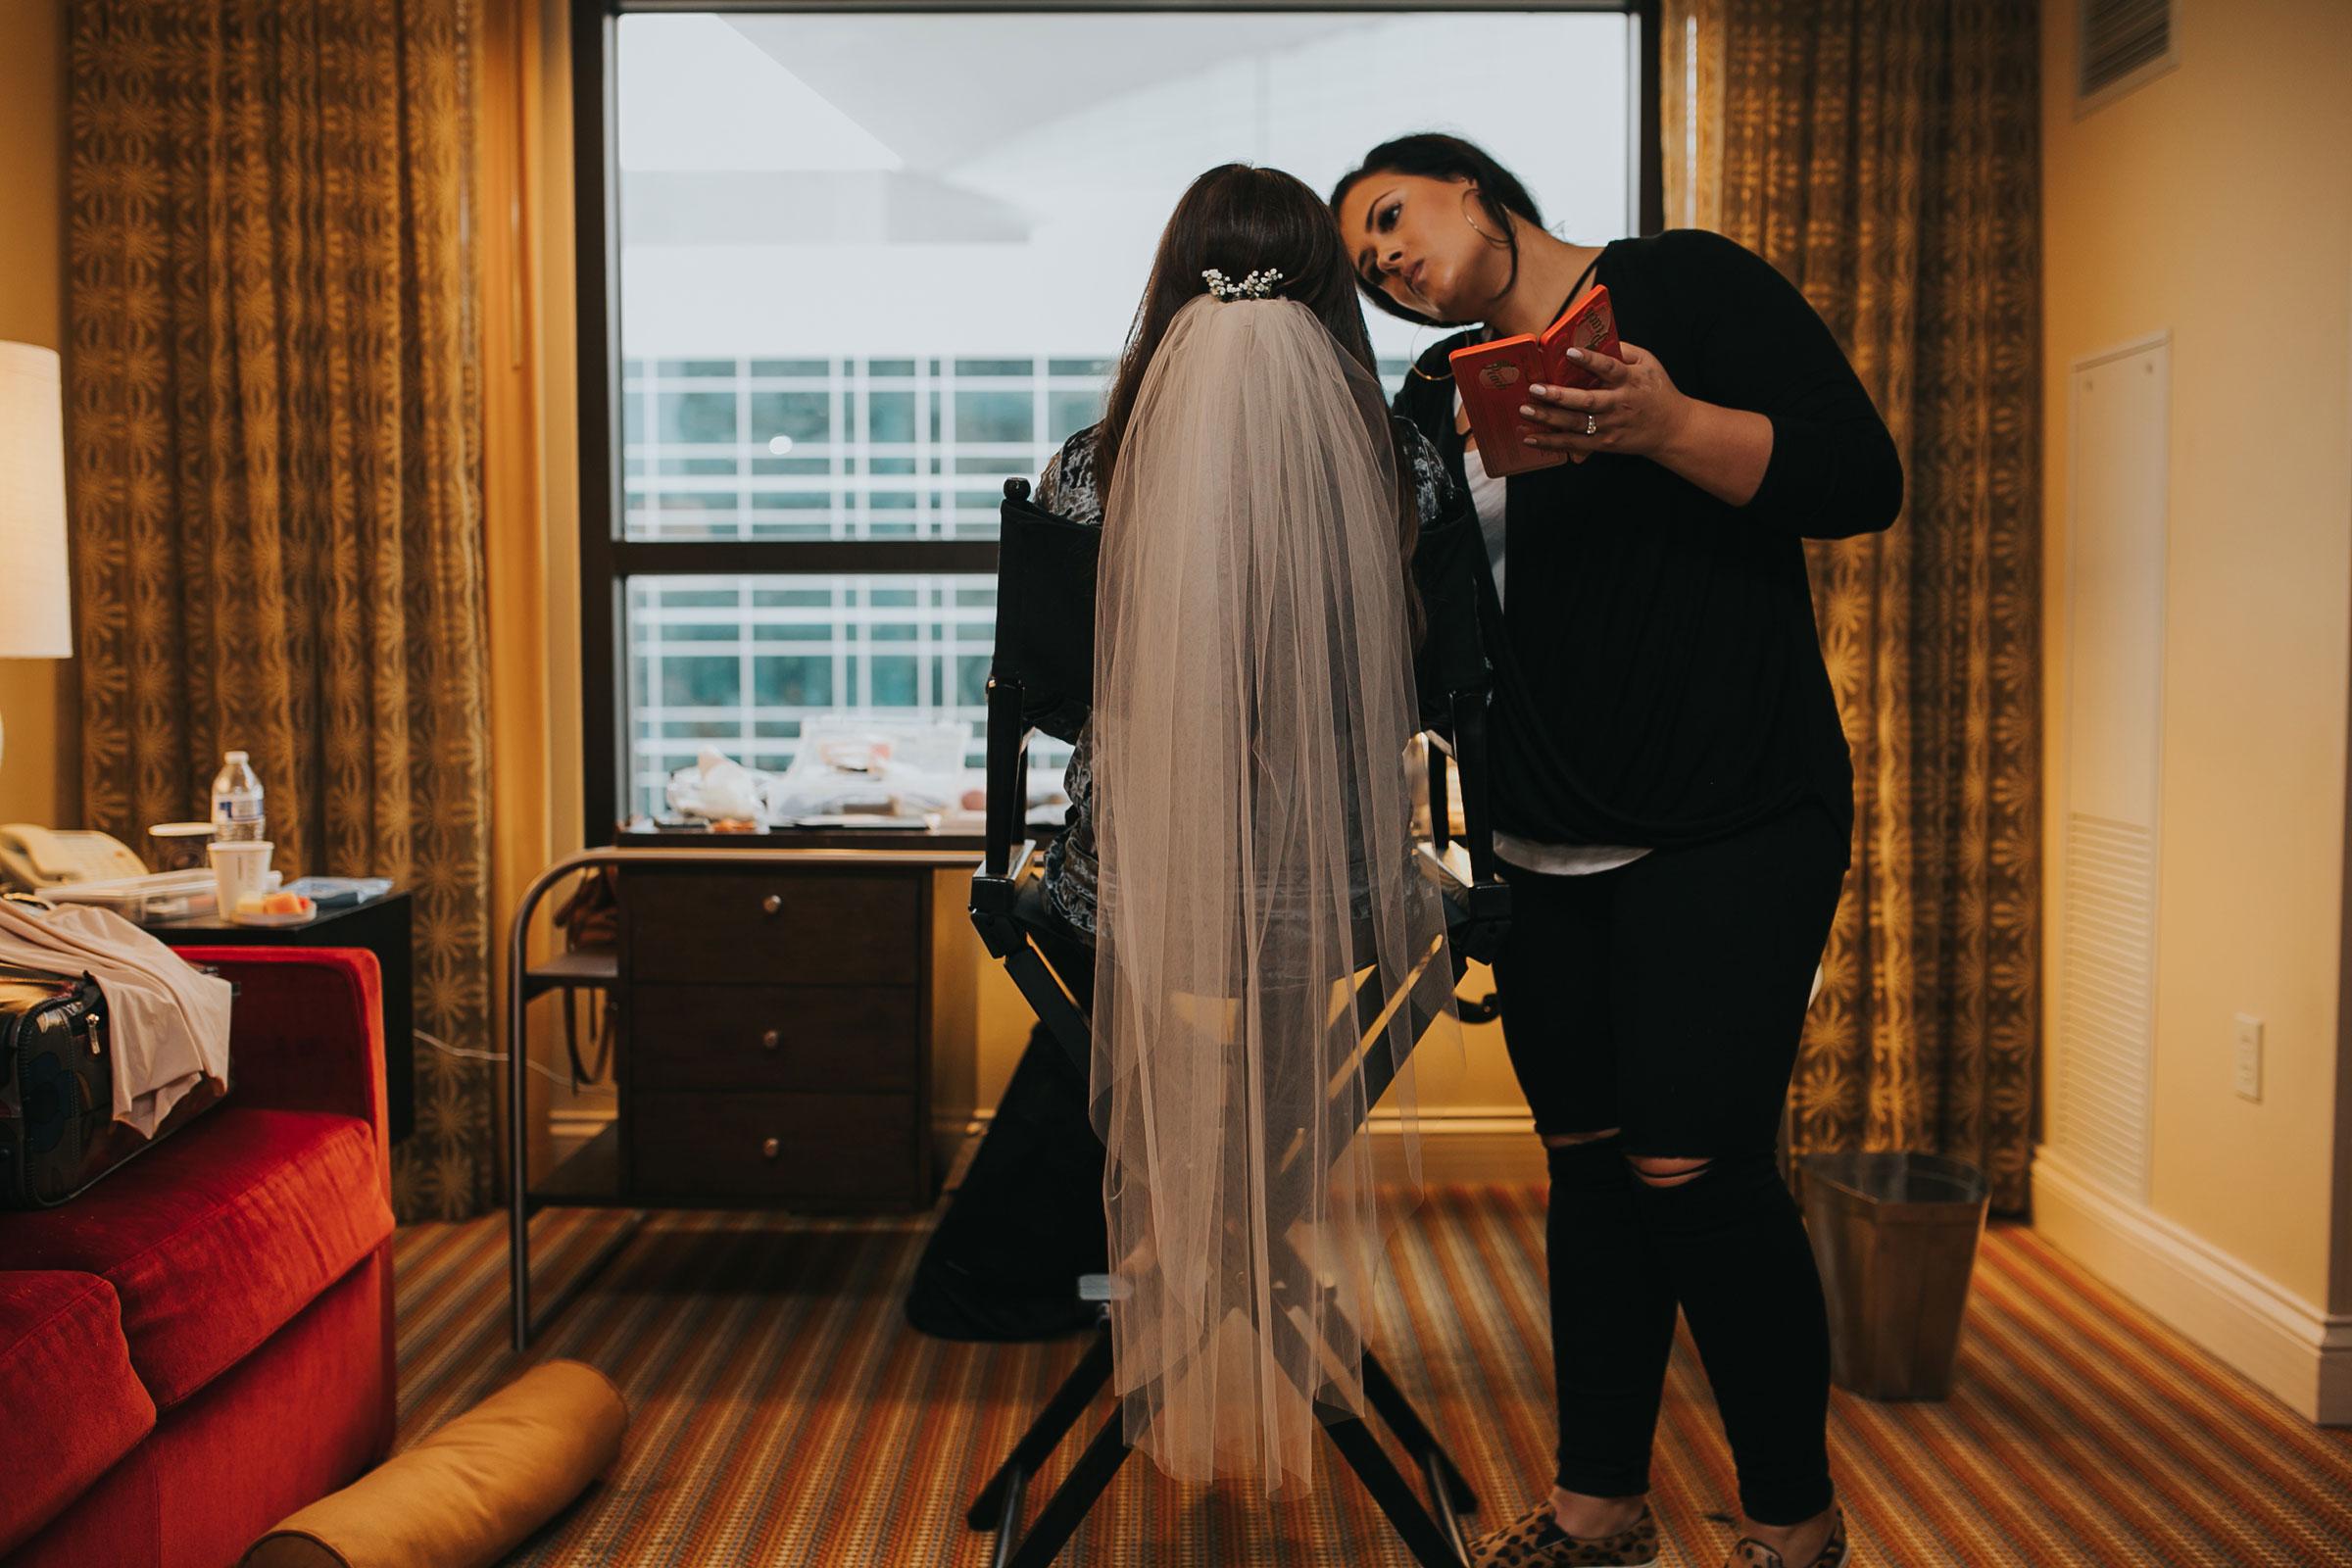 bride-getting-makeup-on-while-wearing-veil-hilton-omaha-nebraska-raelyn-ramey-photography.jpg